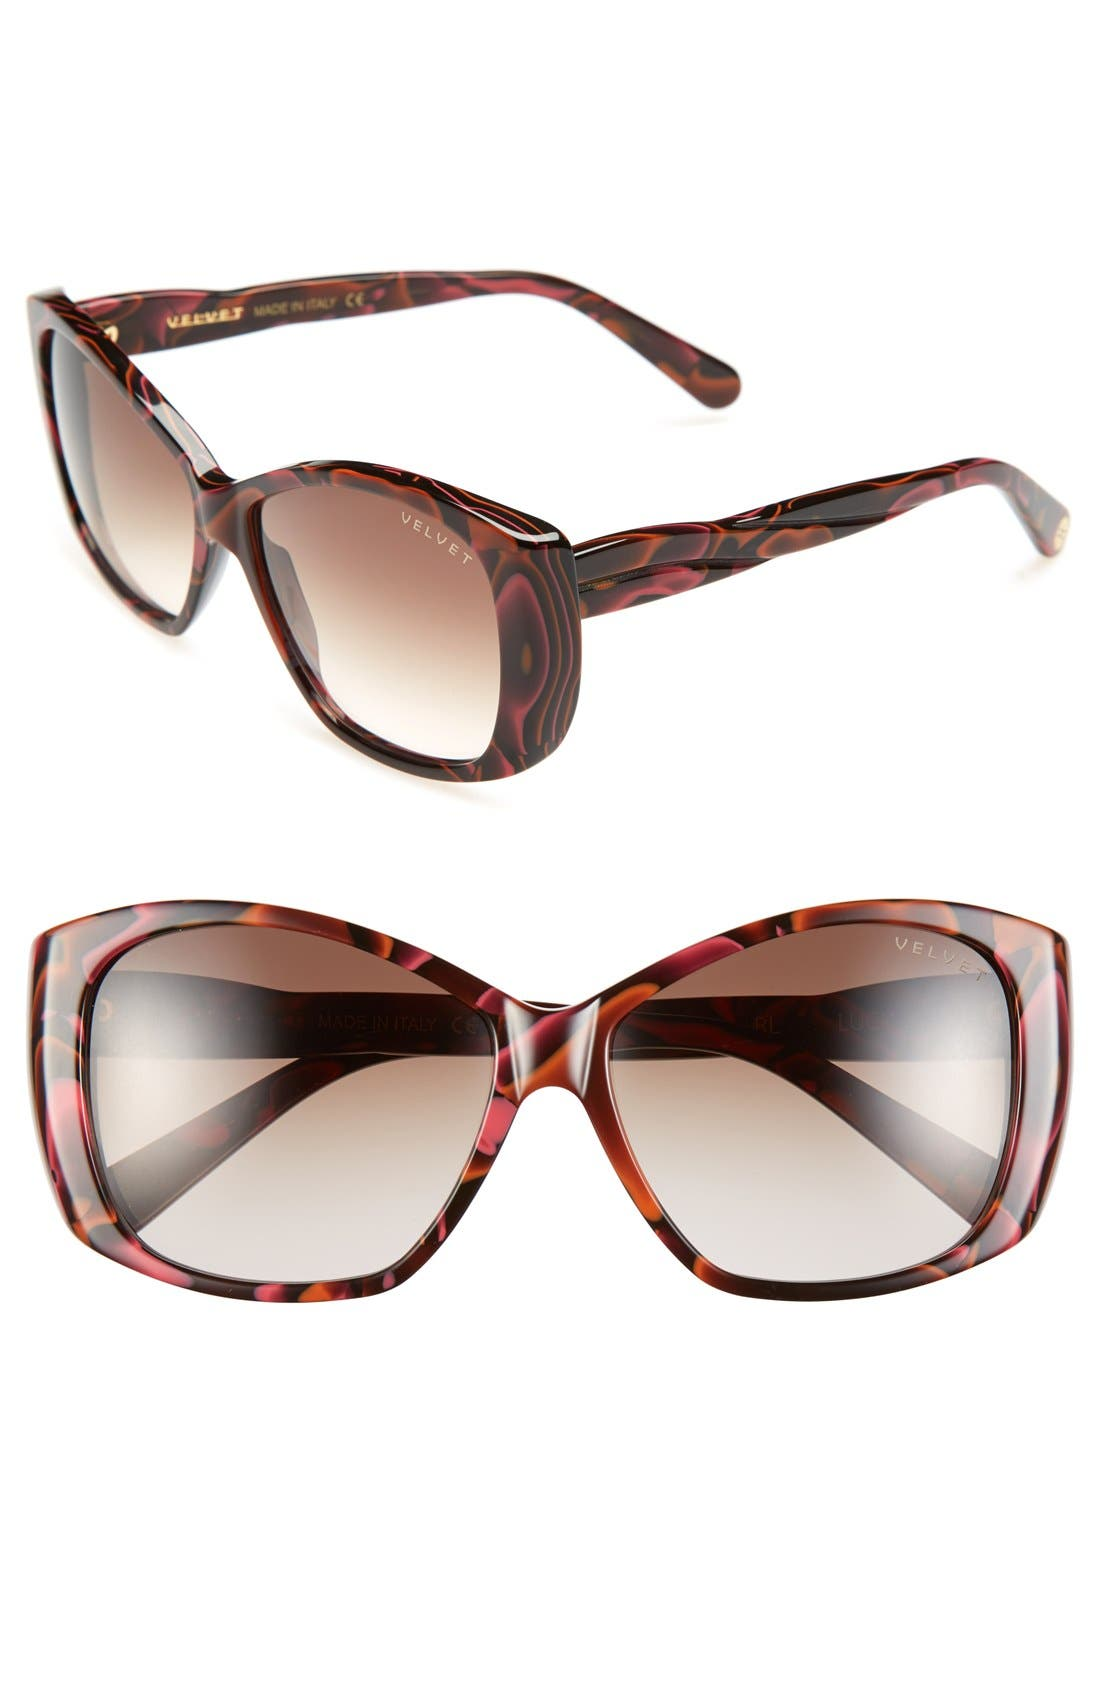 Main Image - Velvet Eyewear 'Lucy' 56mm Butterfly Sunglasses